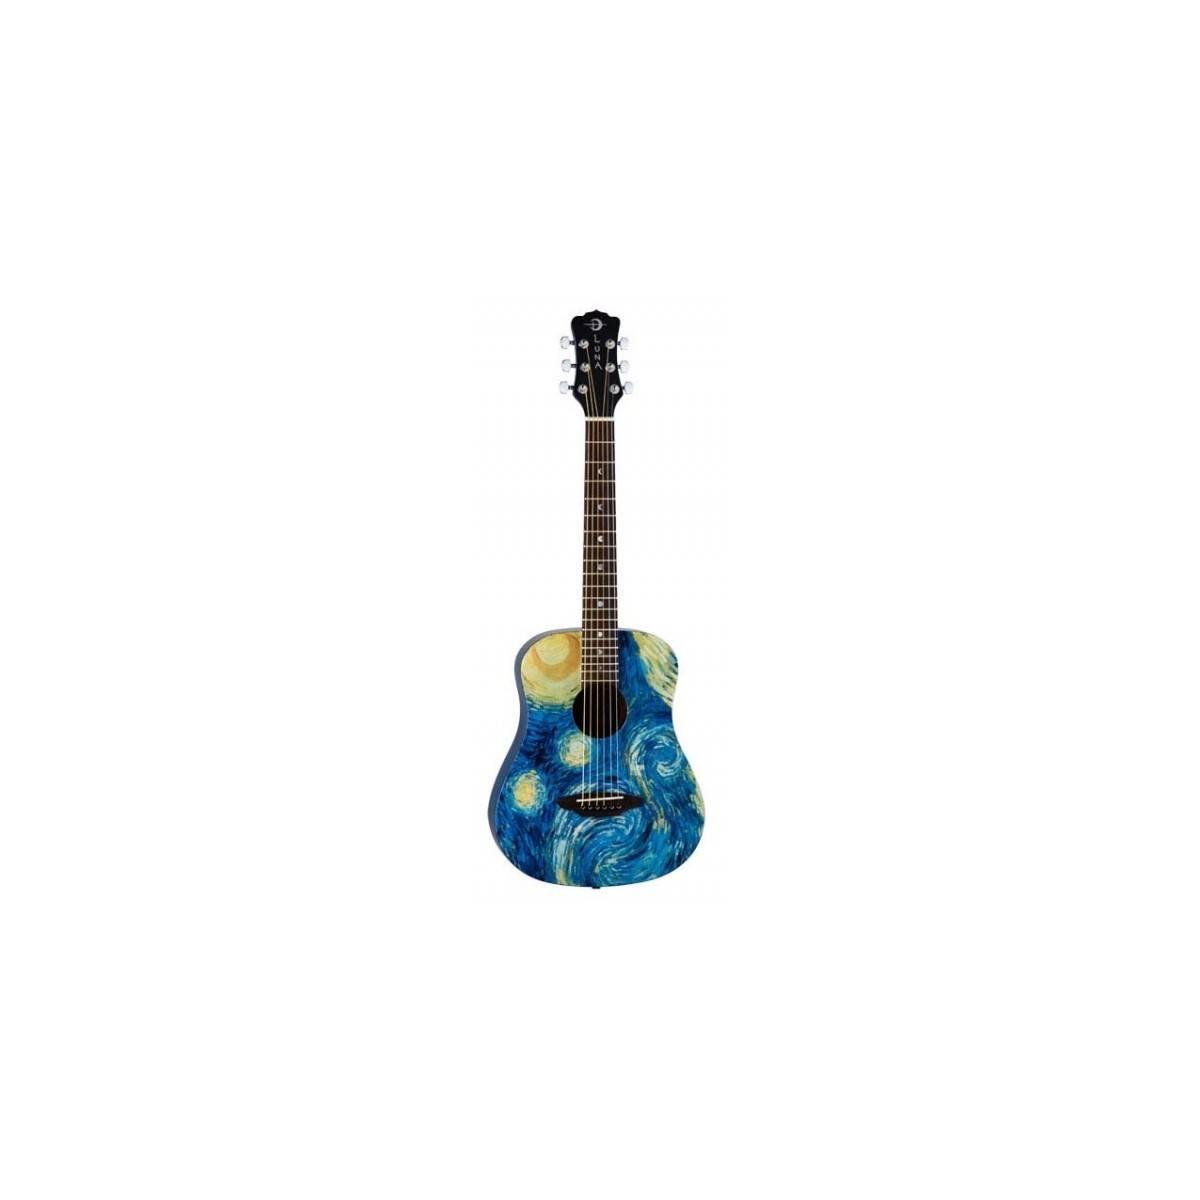 guitare acoustique 3 4 folk luna guitars safari starry. Black Bedroom Furniture Sets. Home Design Ideas